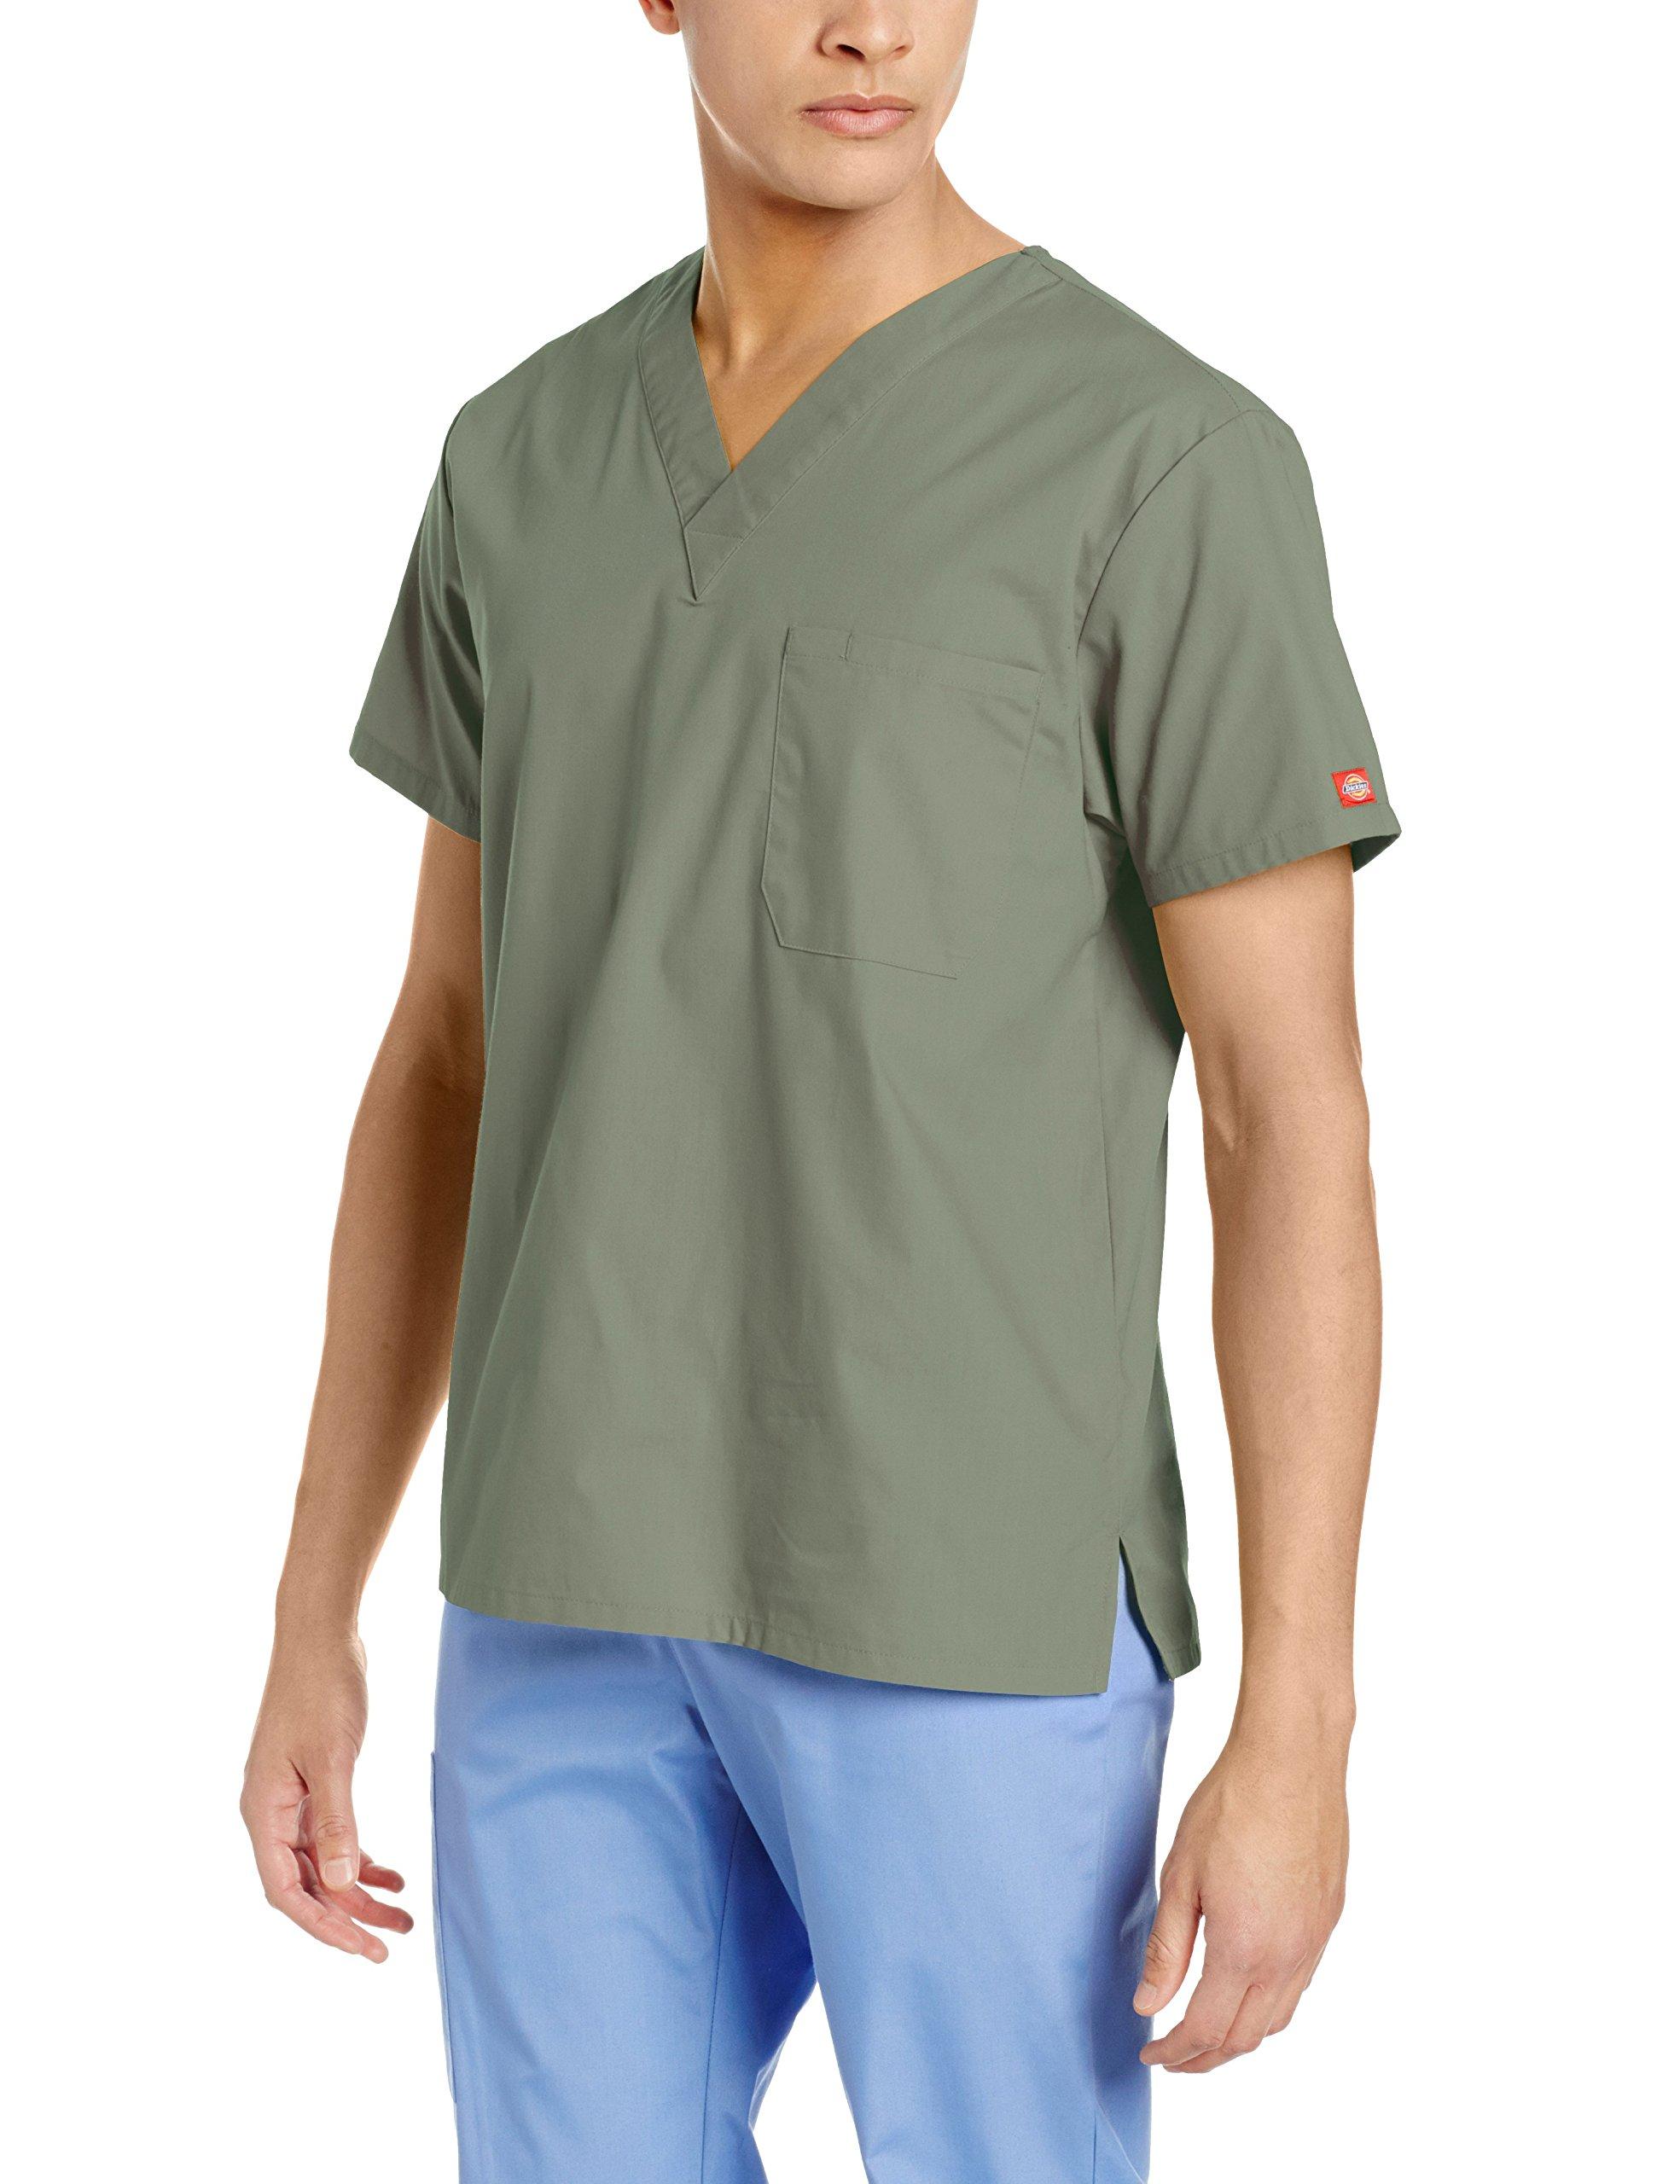 Dickies Men's EDS Signature Unisex V-Neck Scrub Top, Olive, X-Small